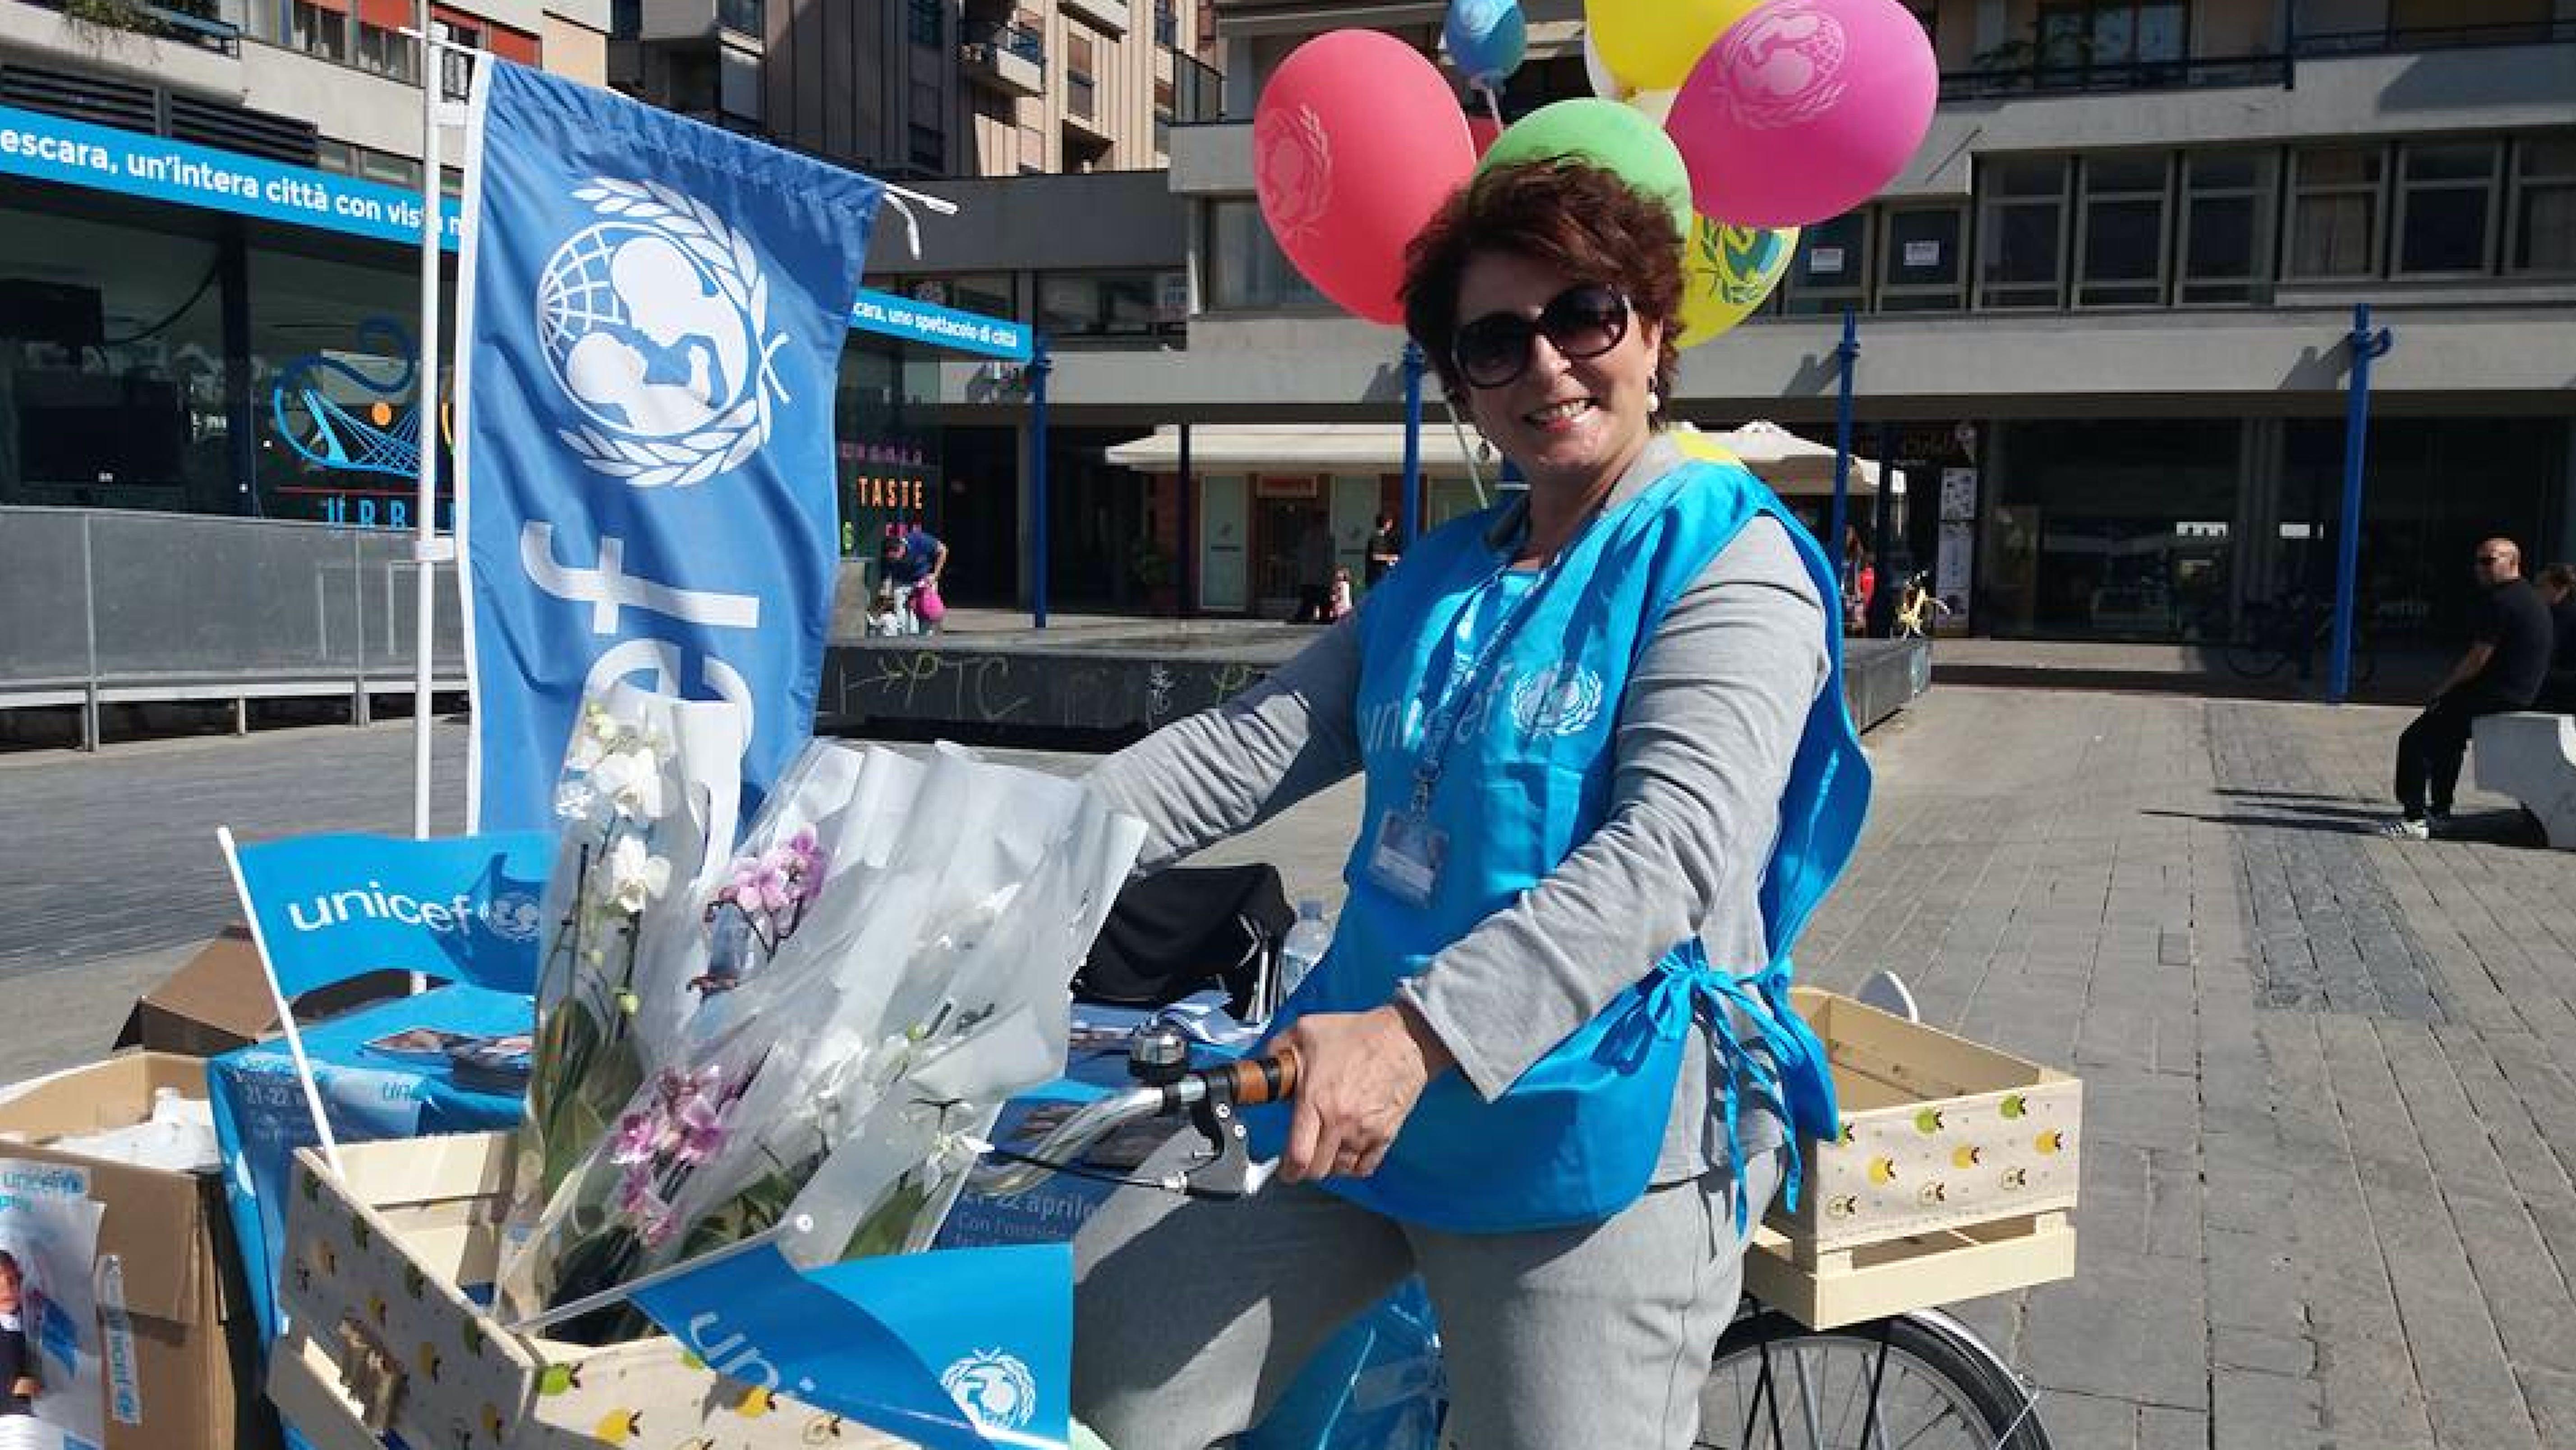 La nostra atletica volontaria di Pescara